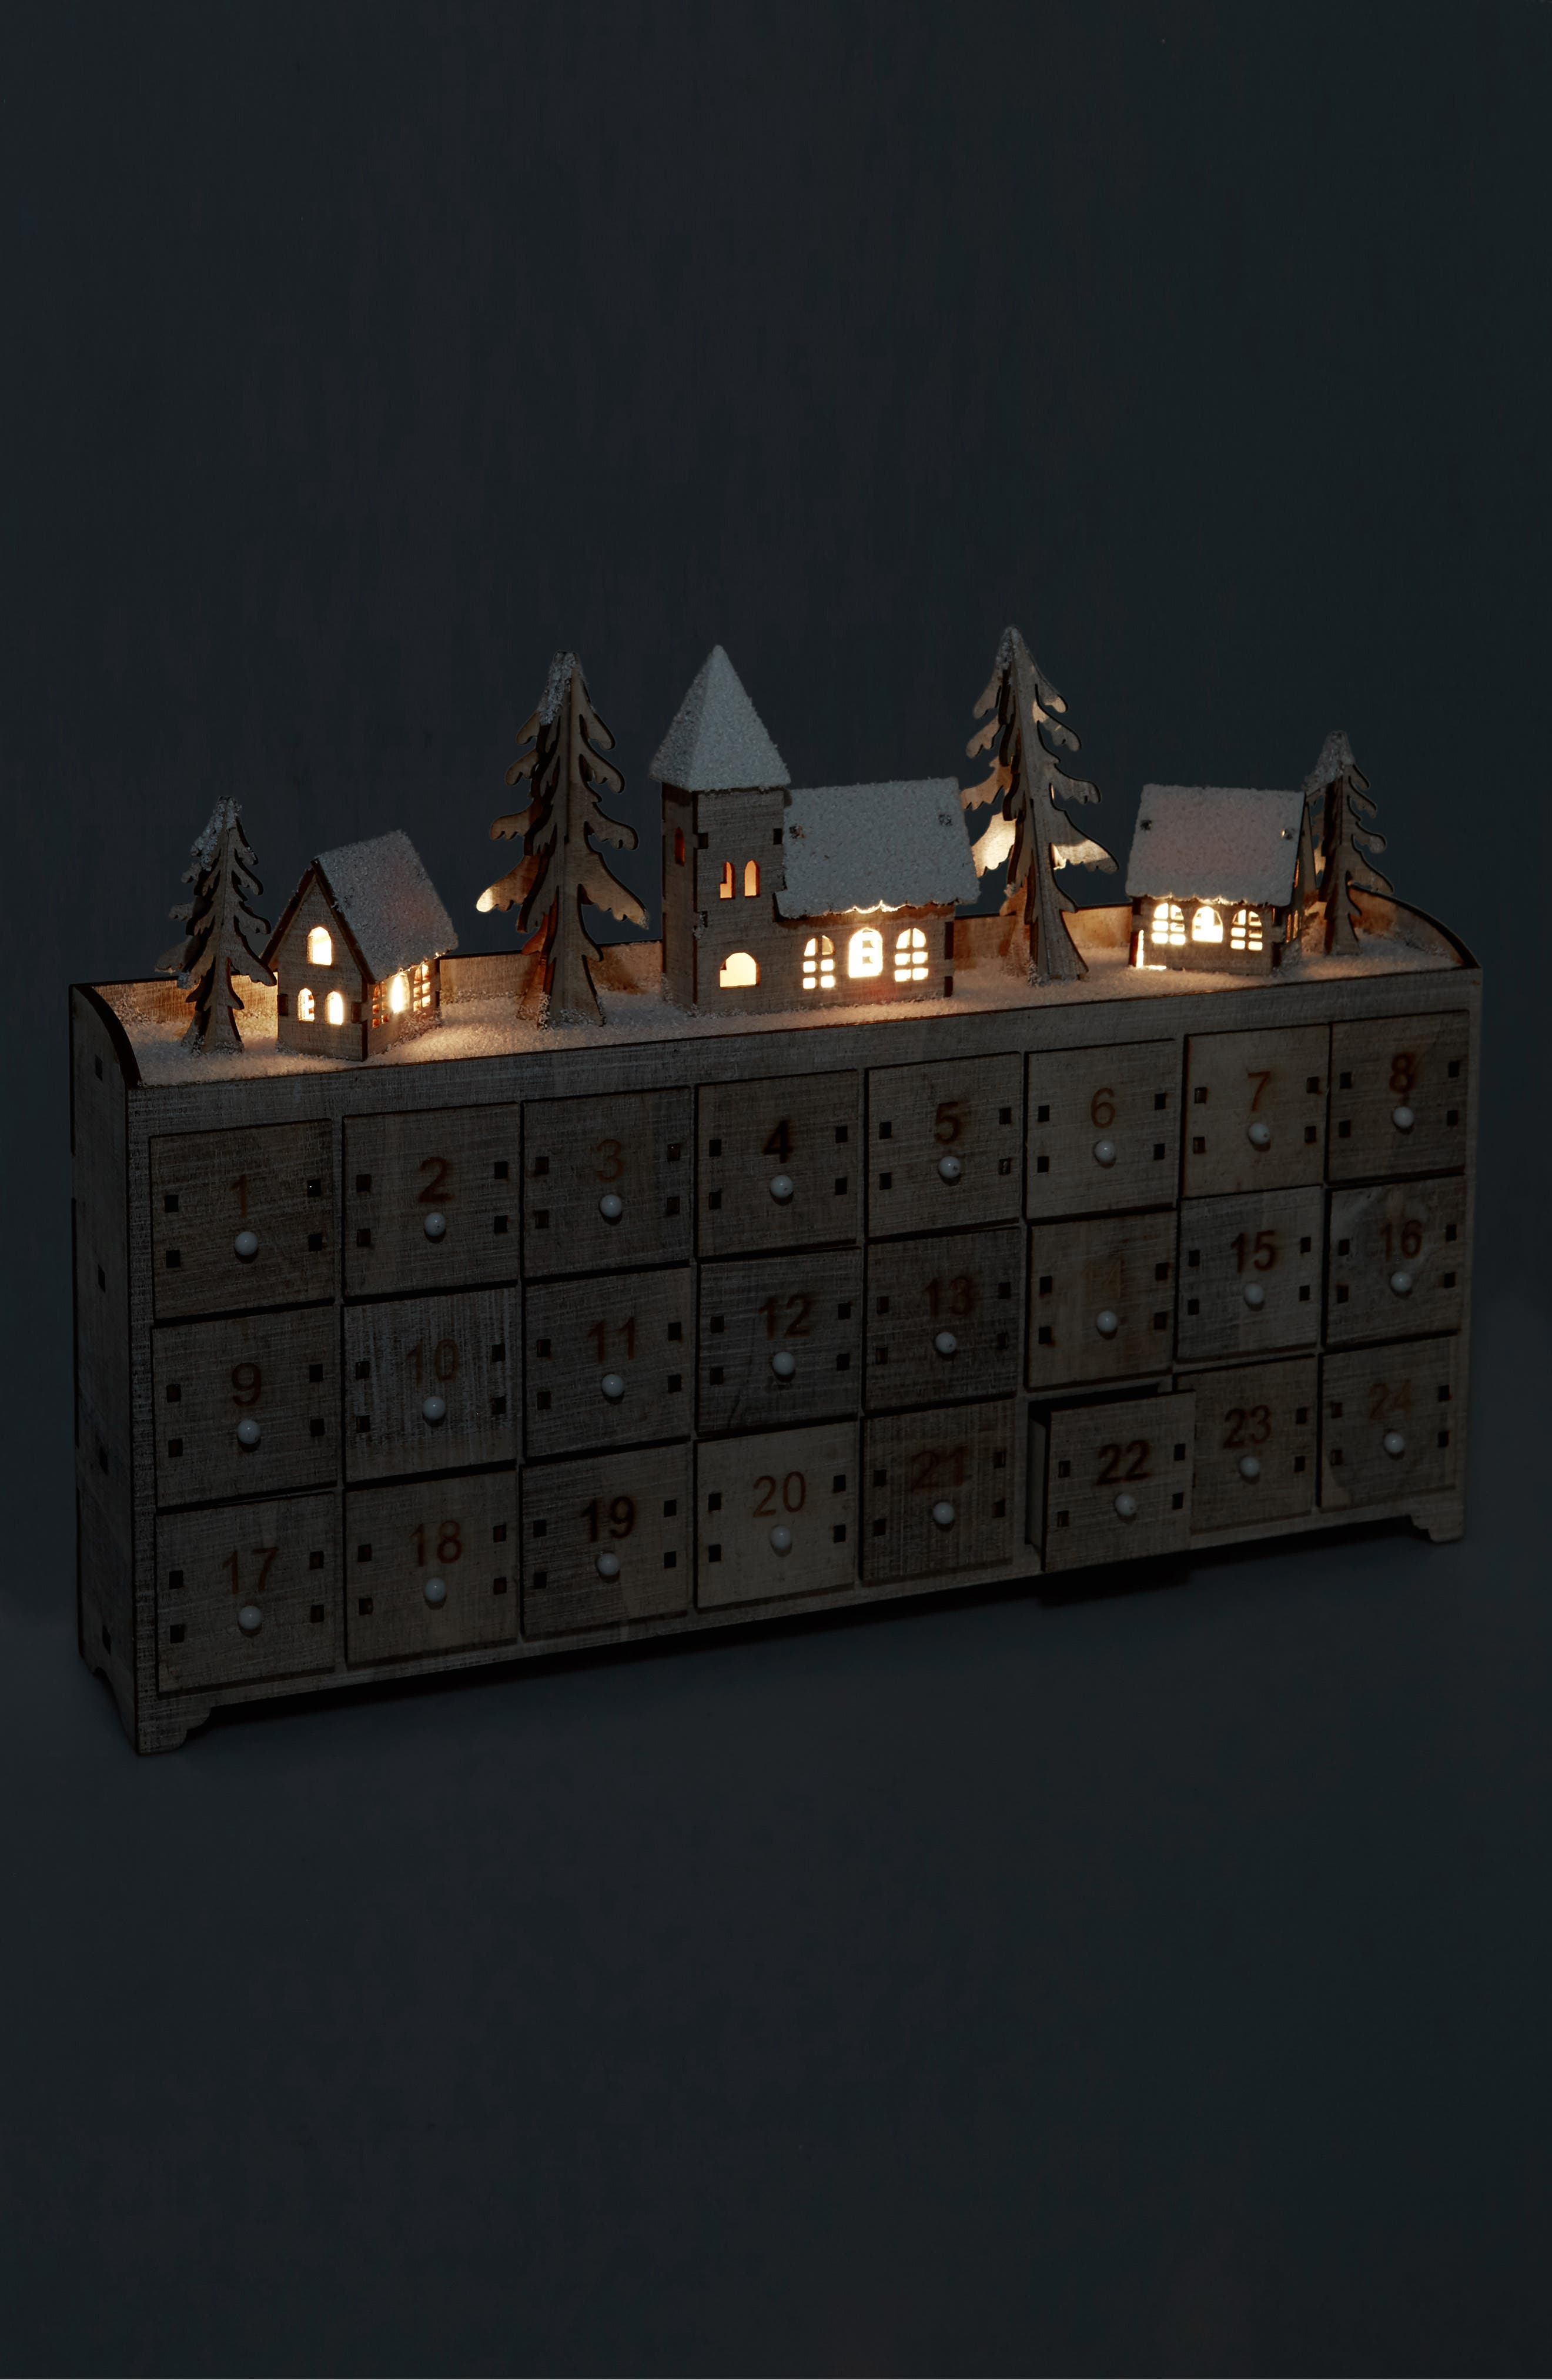 Light-Up Advent Calendar,                             Alternate thumbnail 2, color,                             Natural Wood